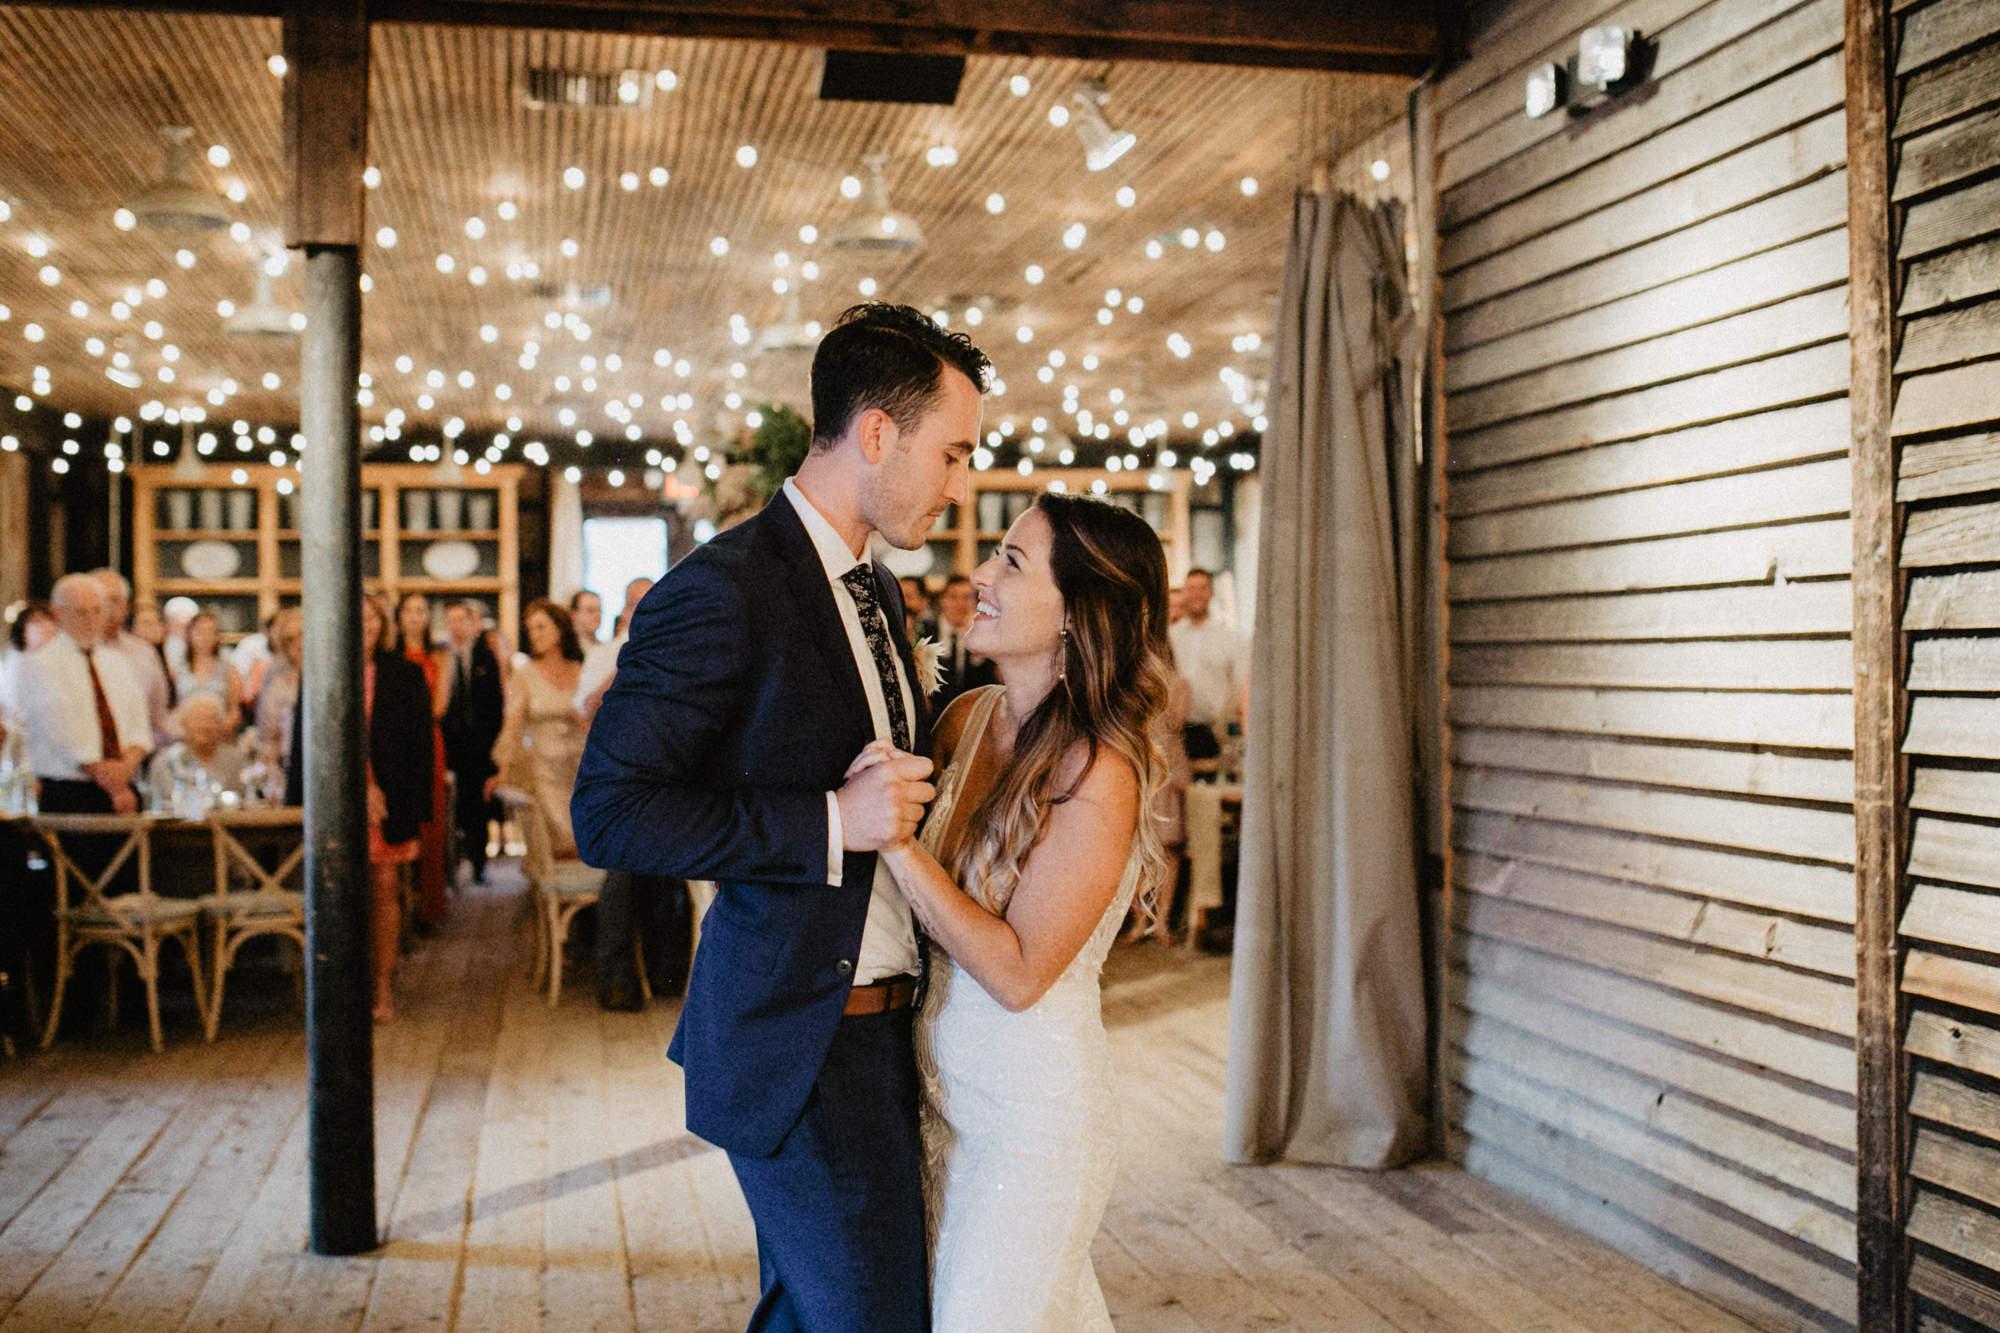 terrain-events-wedding-photographer-52.jpg